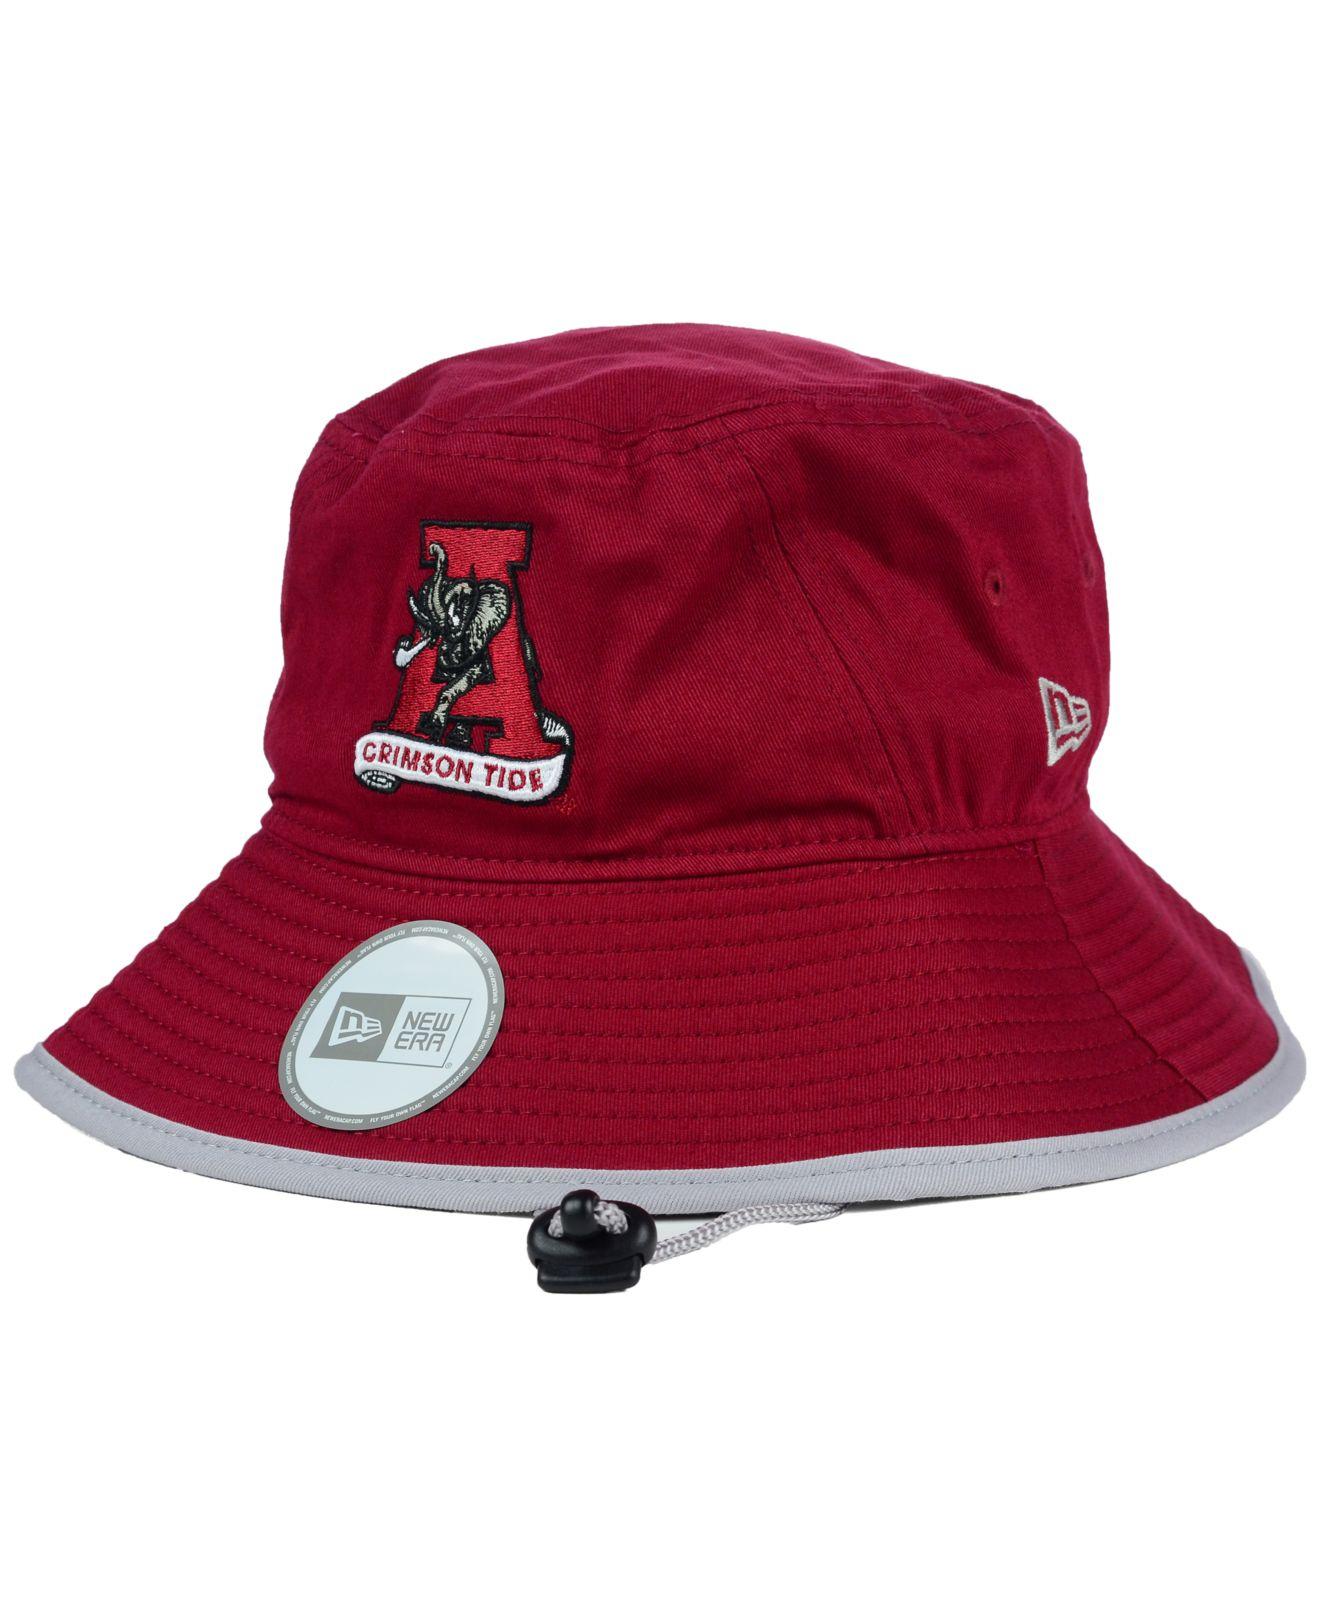 63e0fef2488 ... amazon lyst ktz alabama crimson tide tip bucket hat in red for men  abefa 8cb81